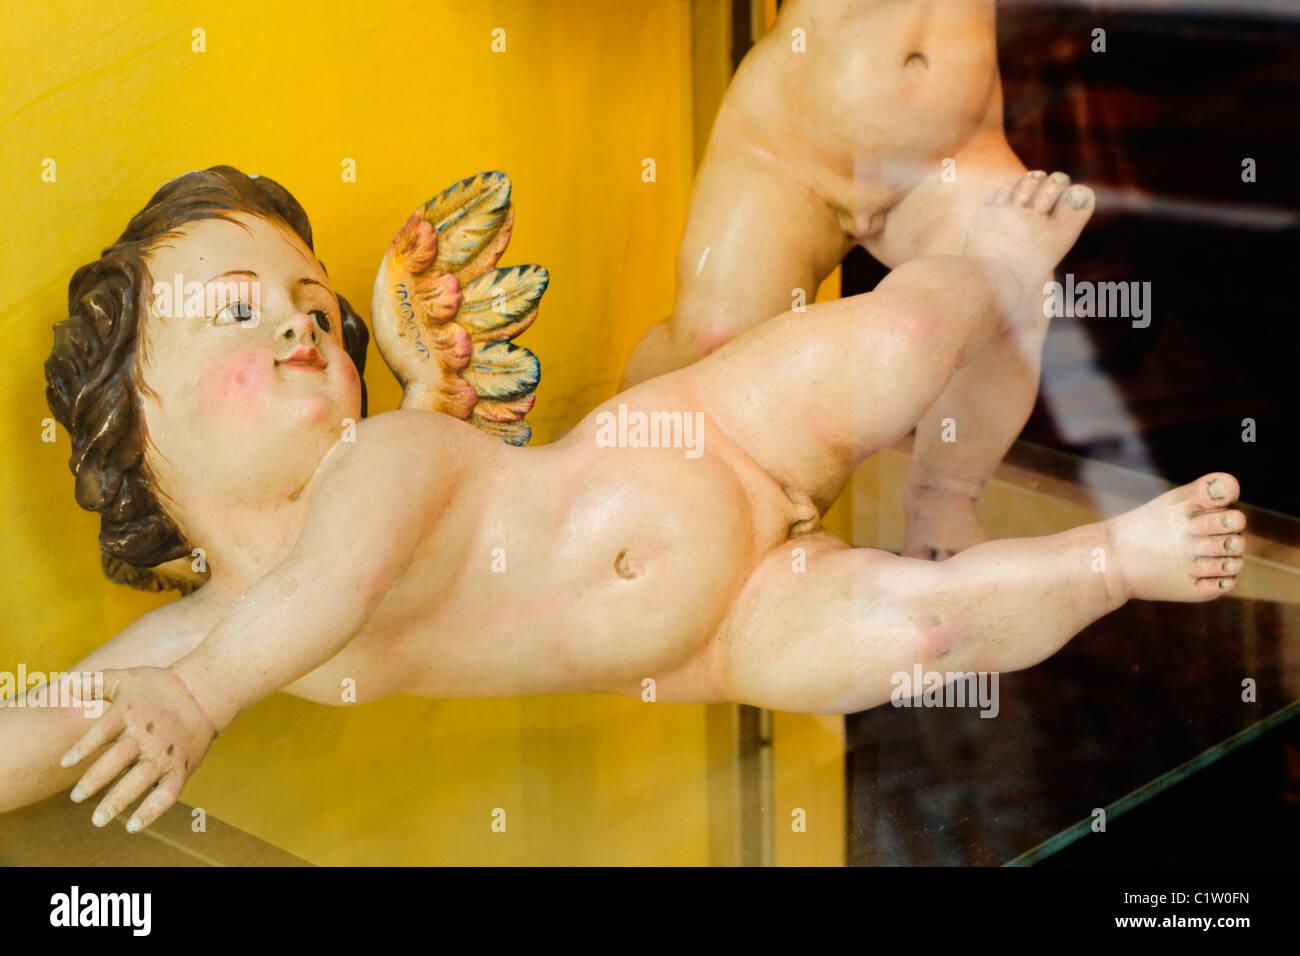 Statue of cherub in antique shop window, Marbella, Spain. - Stock Image